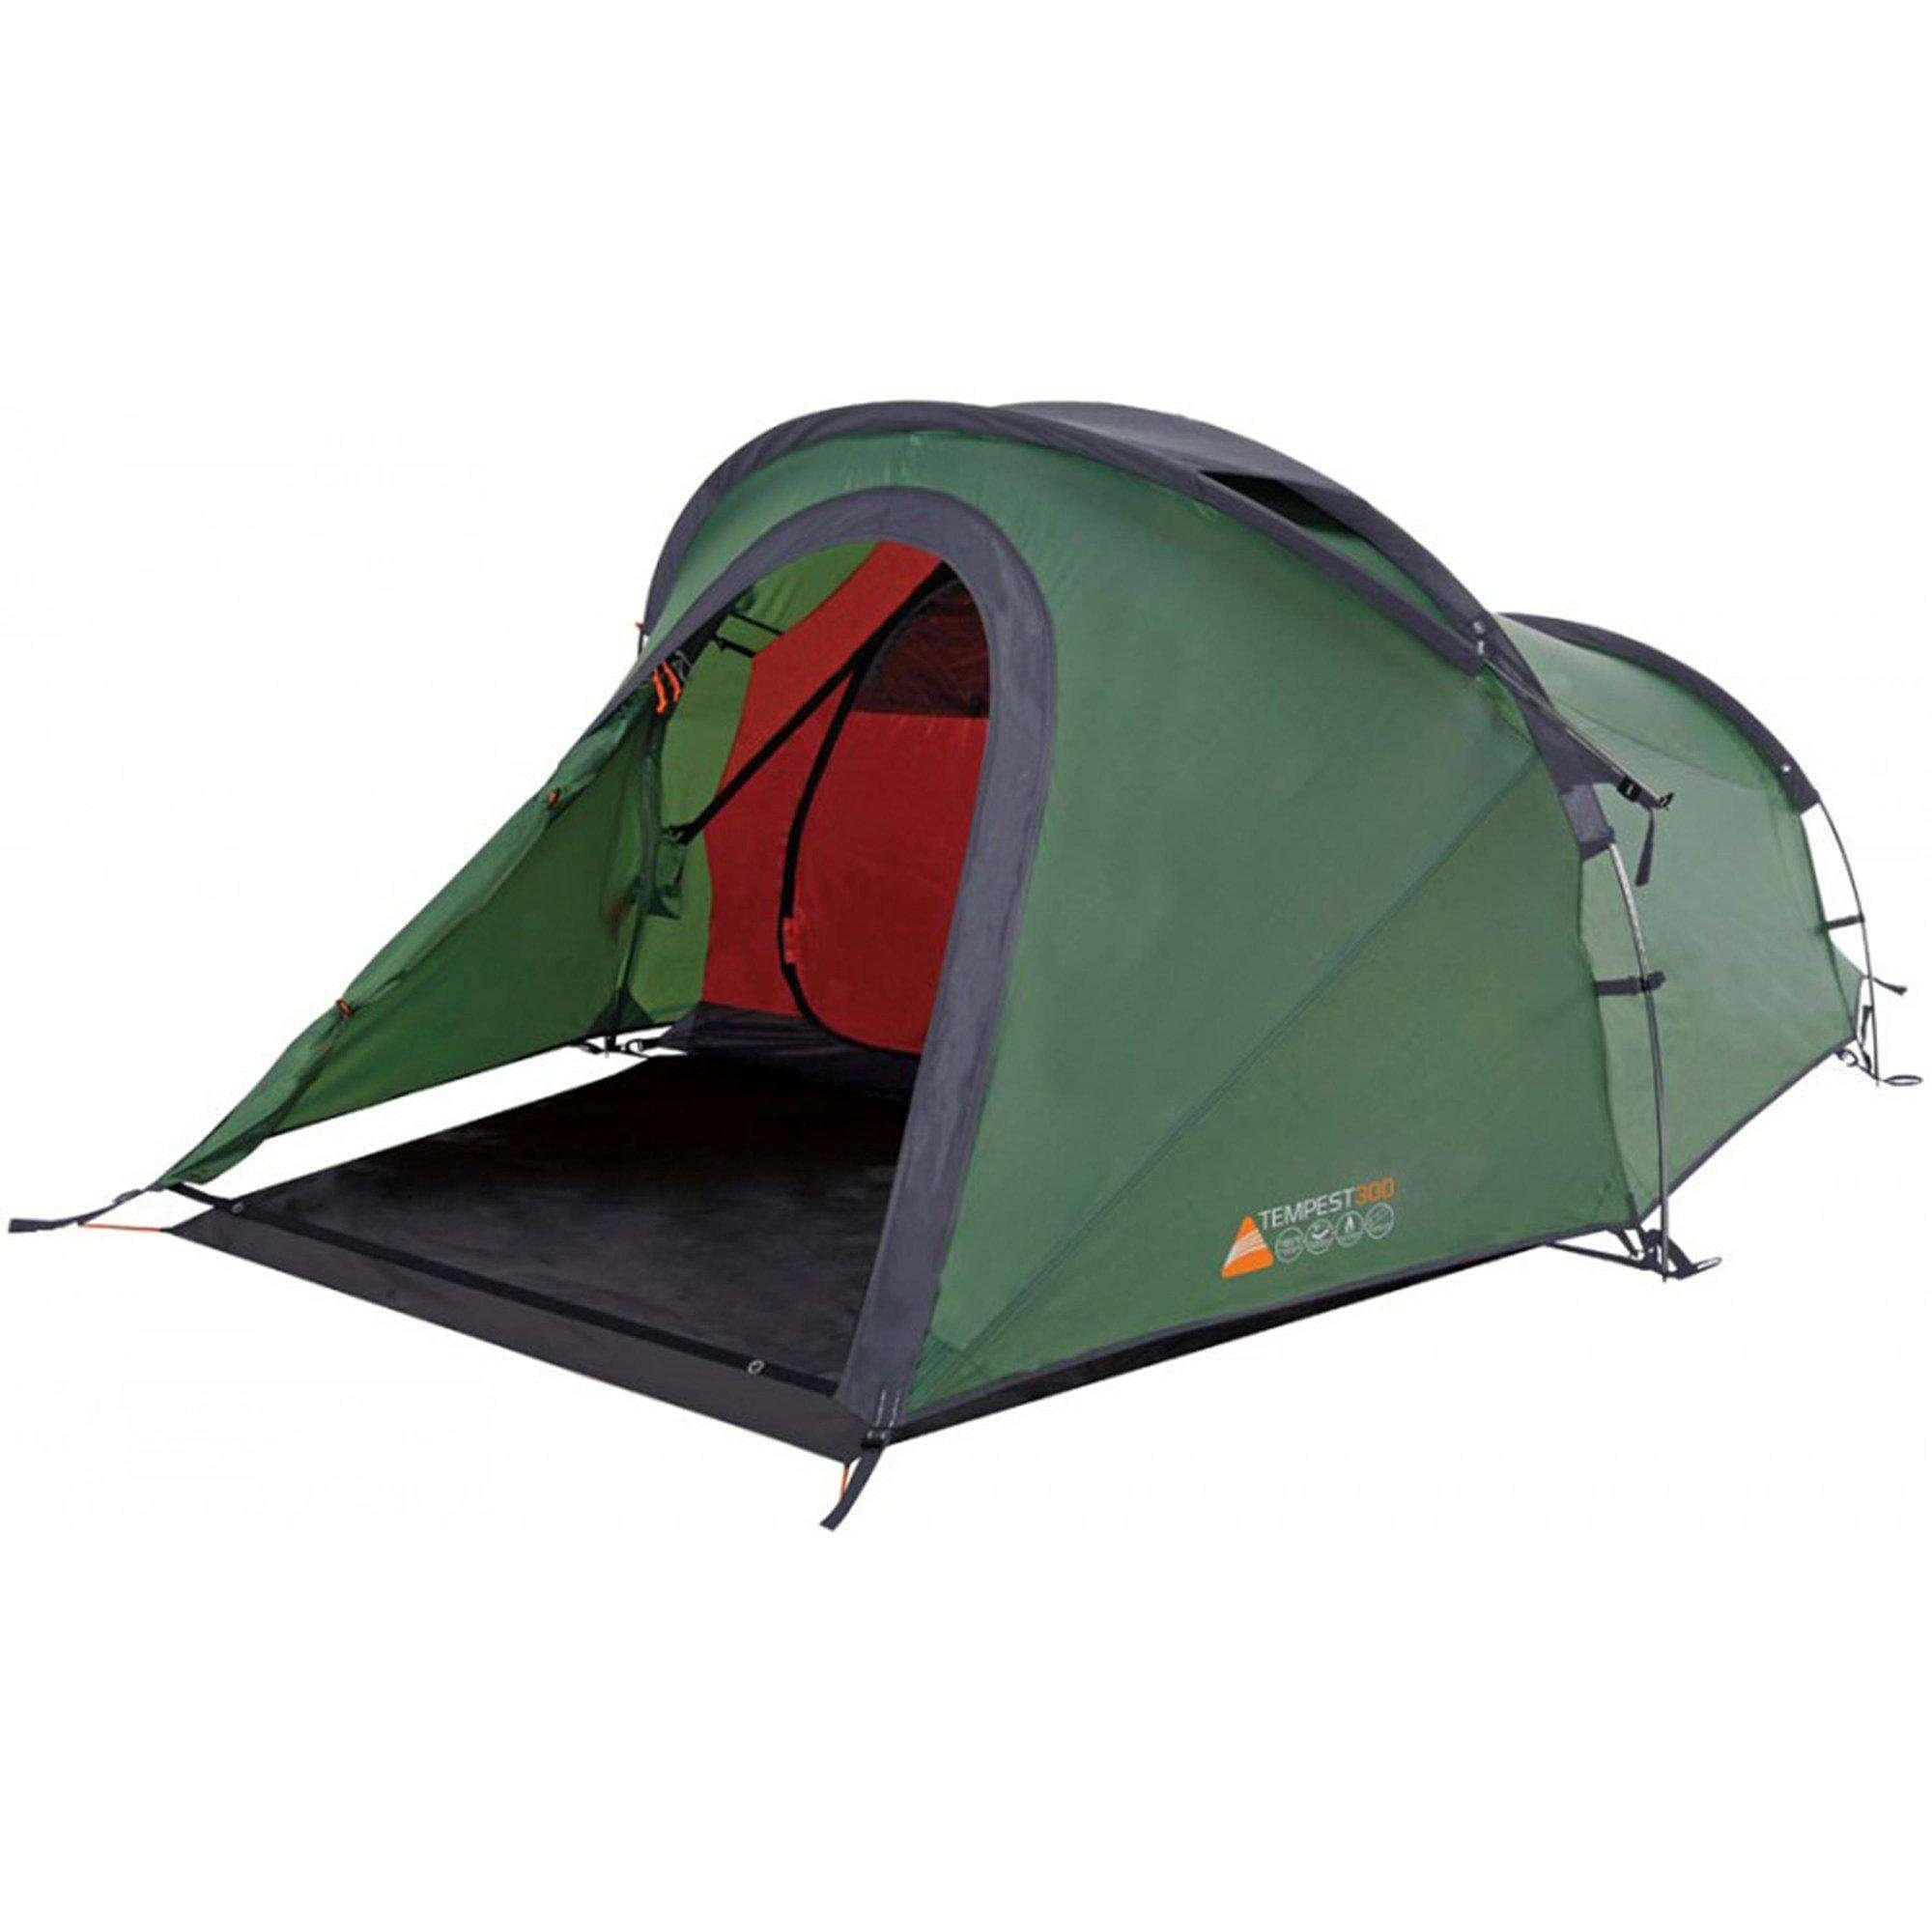 VANGO Tempest 300 3 Man Tent